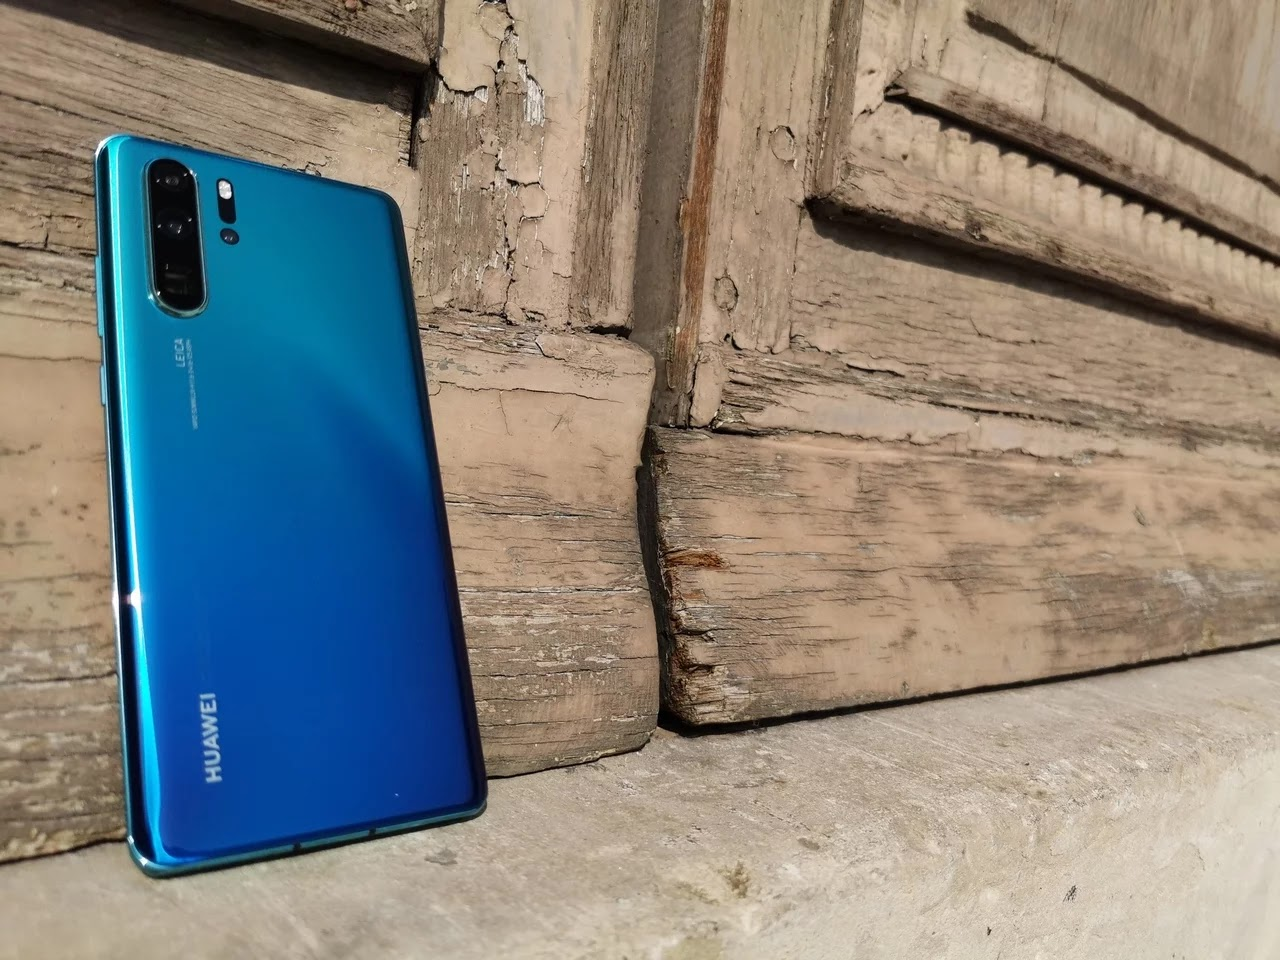 وقف عمل هواتف Huawei بنظام أندرويد من Google